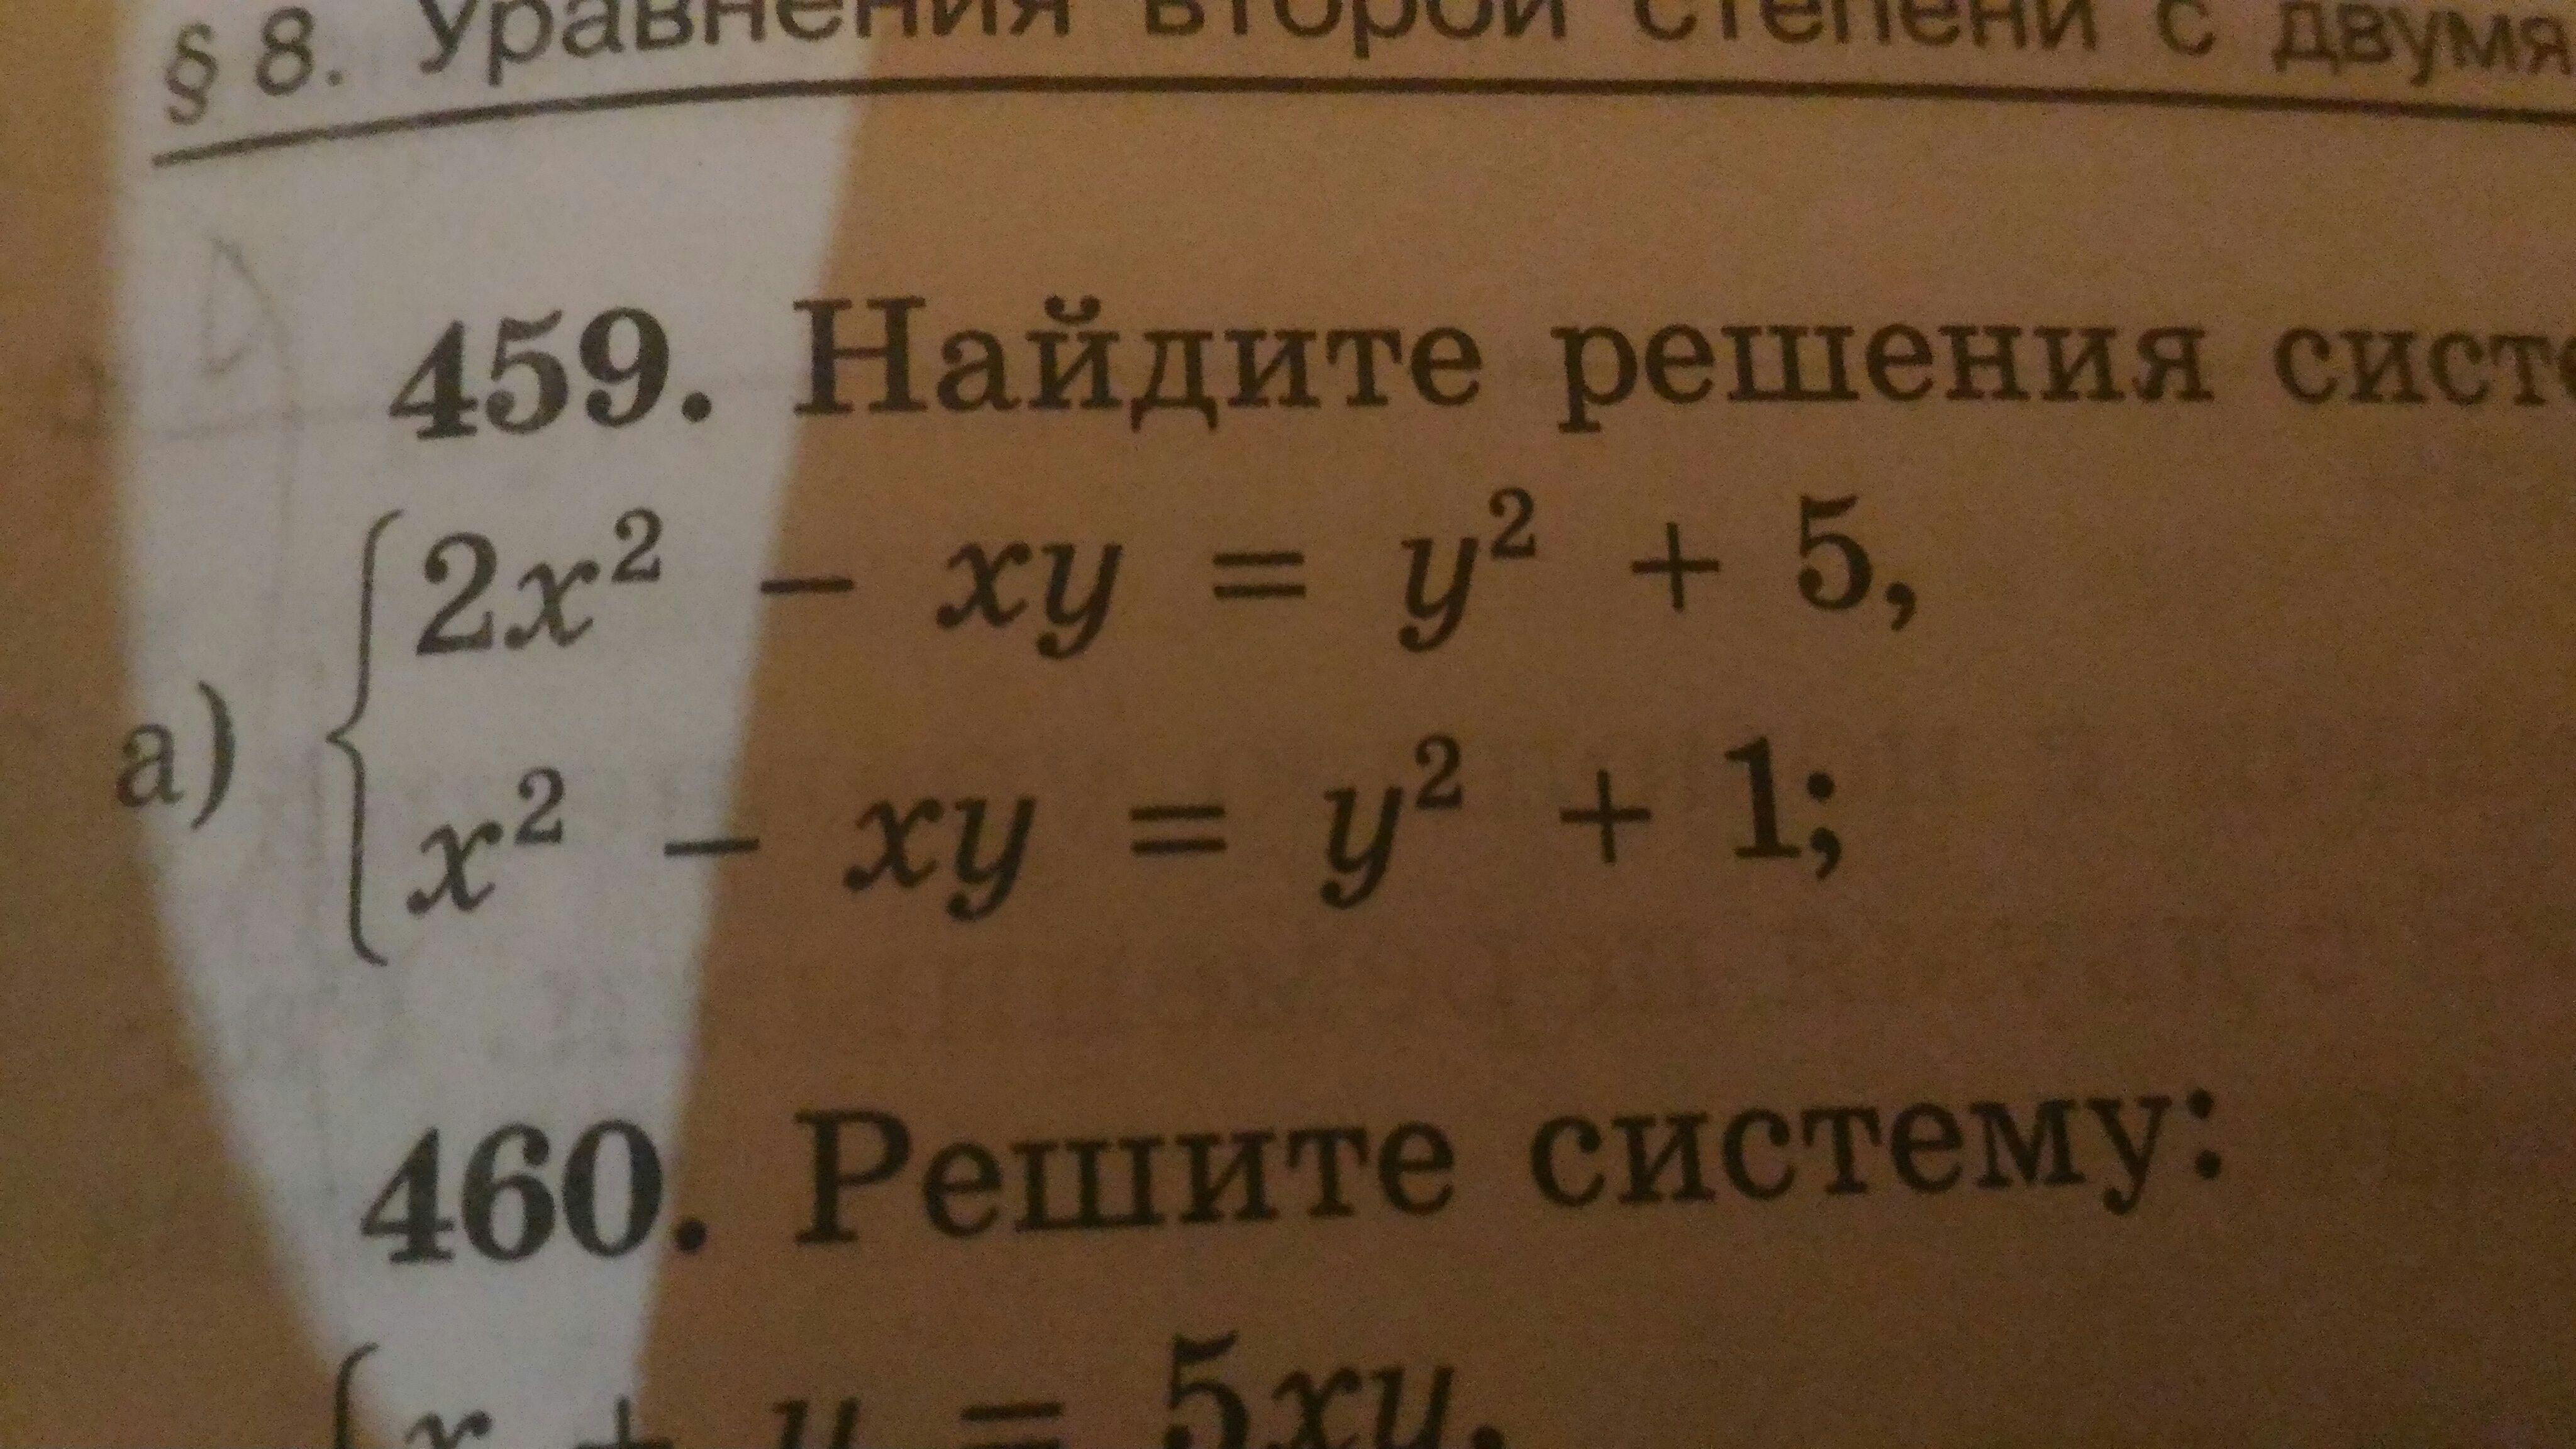 Решите систему уравнений с объяснением пж?